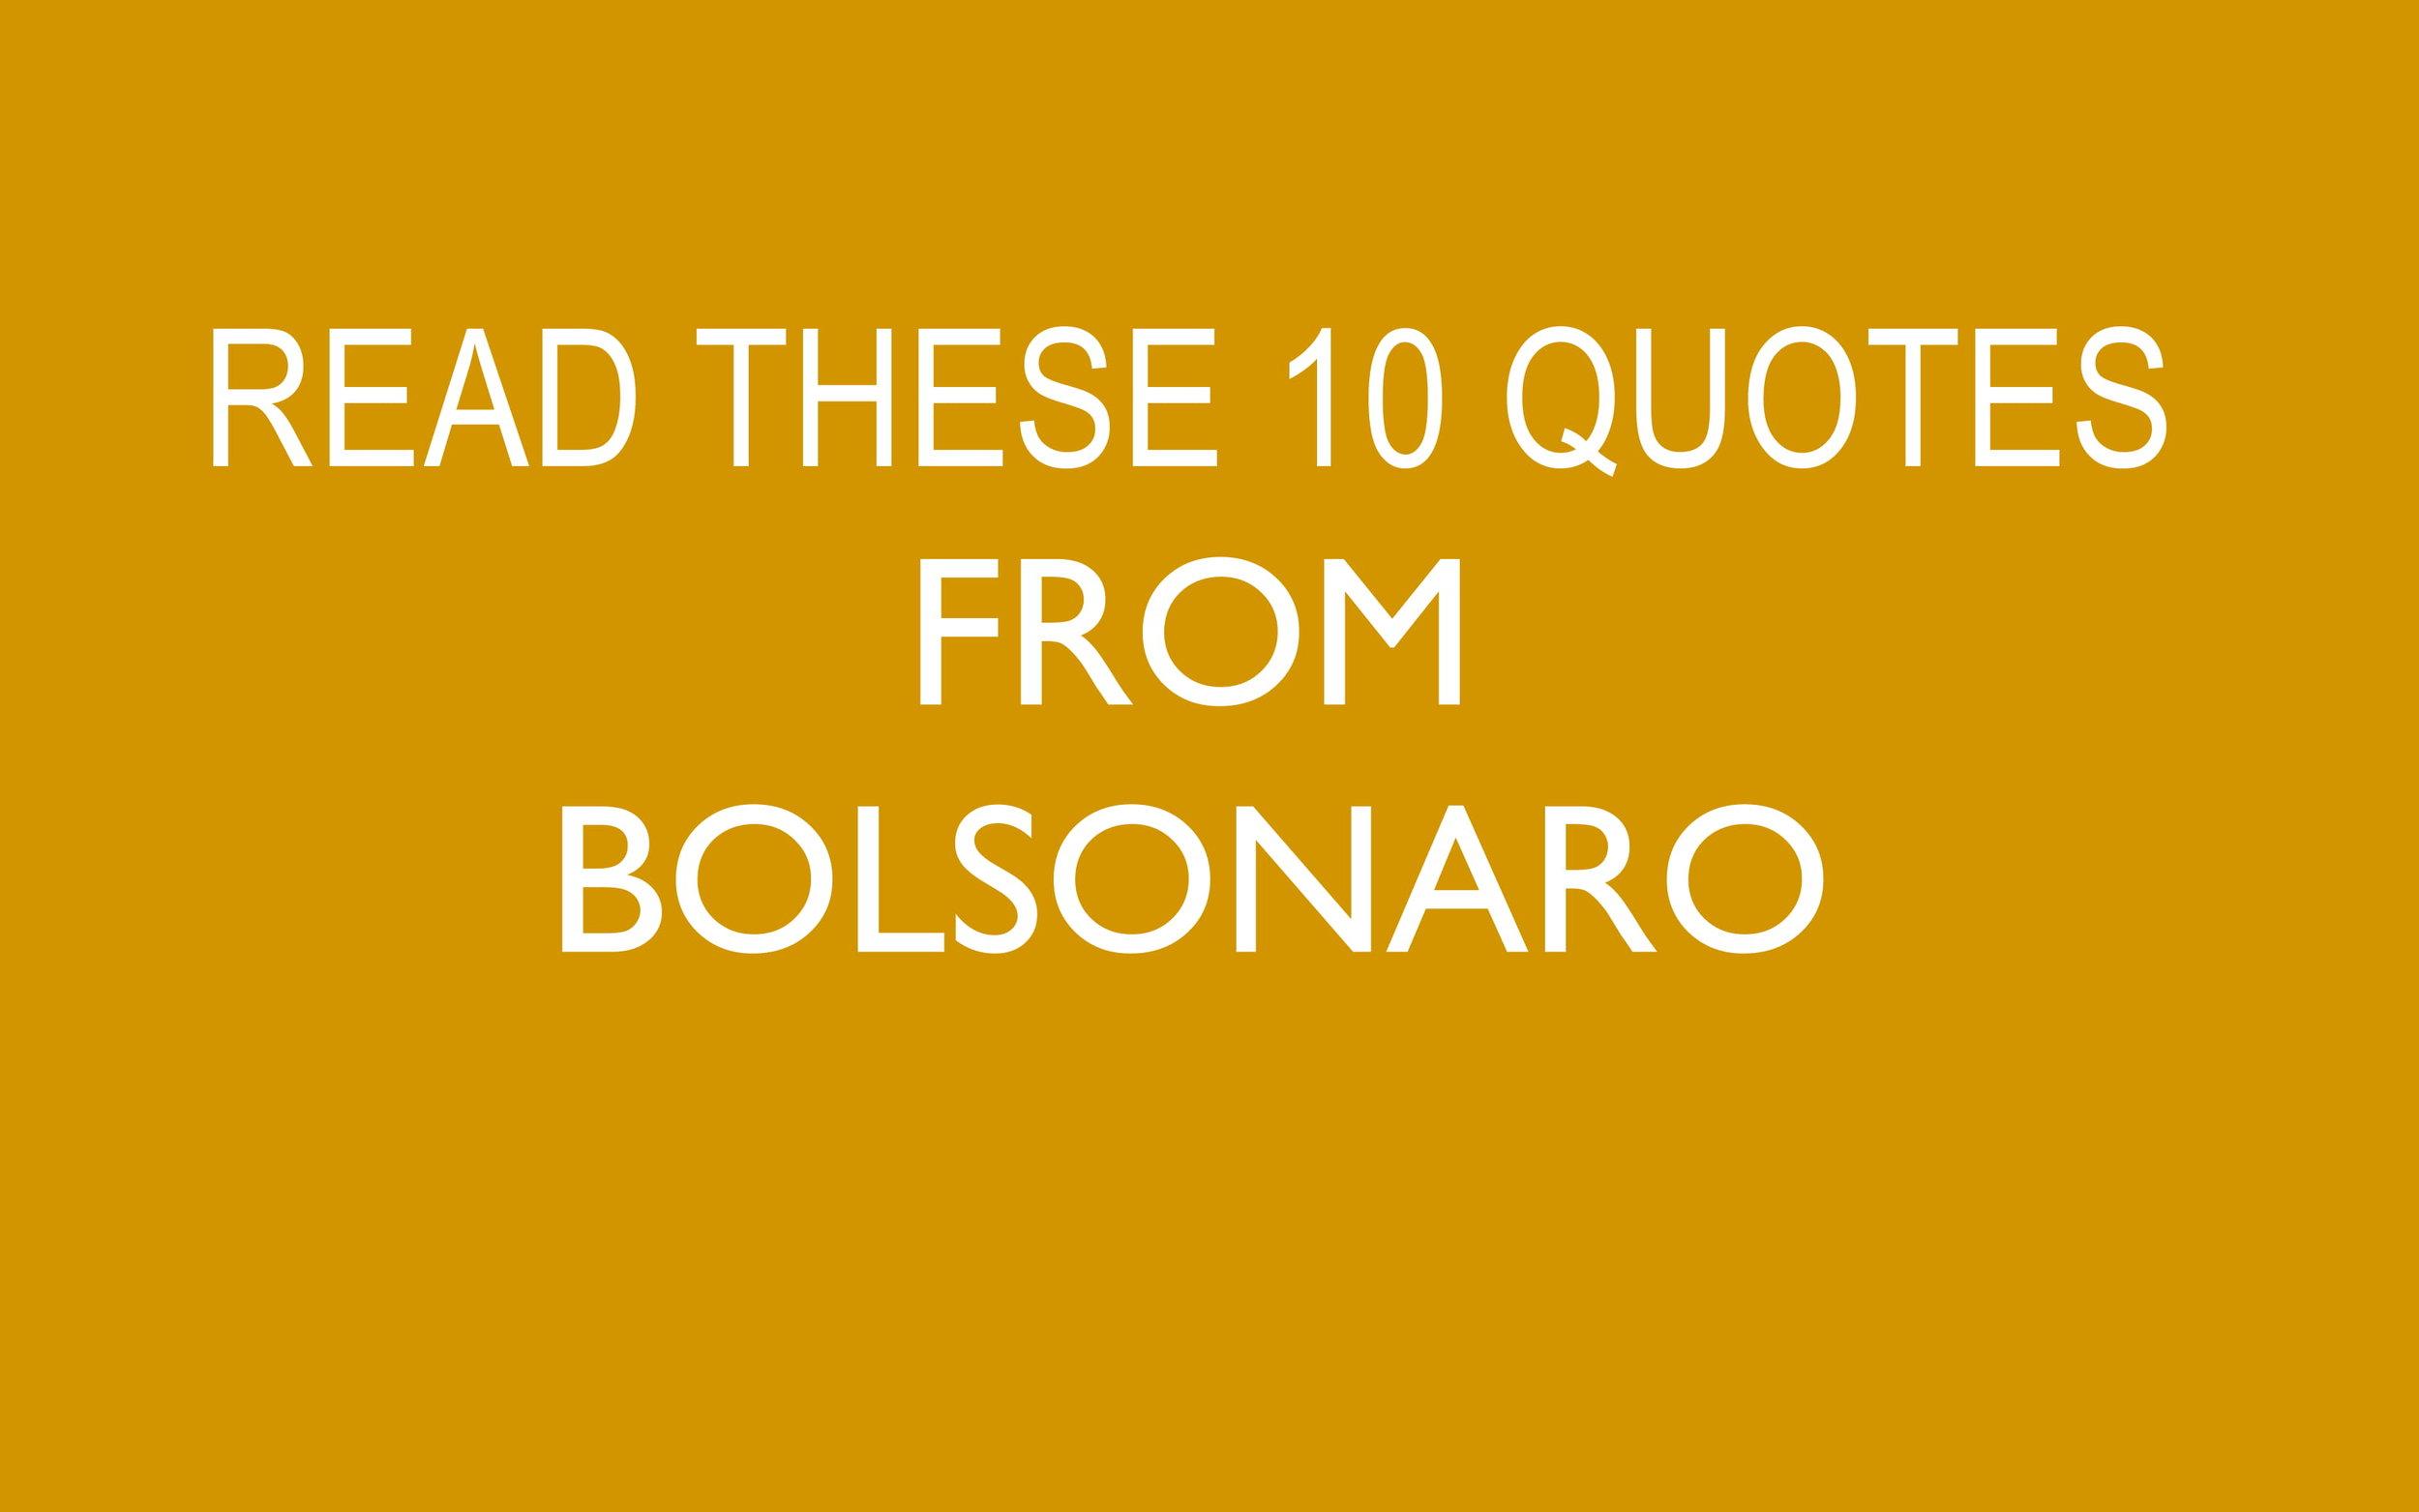 10 Bolsonaro Quotes_7 October Brazil Elections-05.jpg